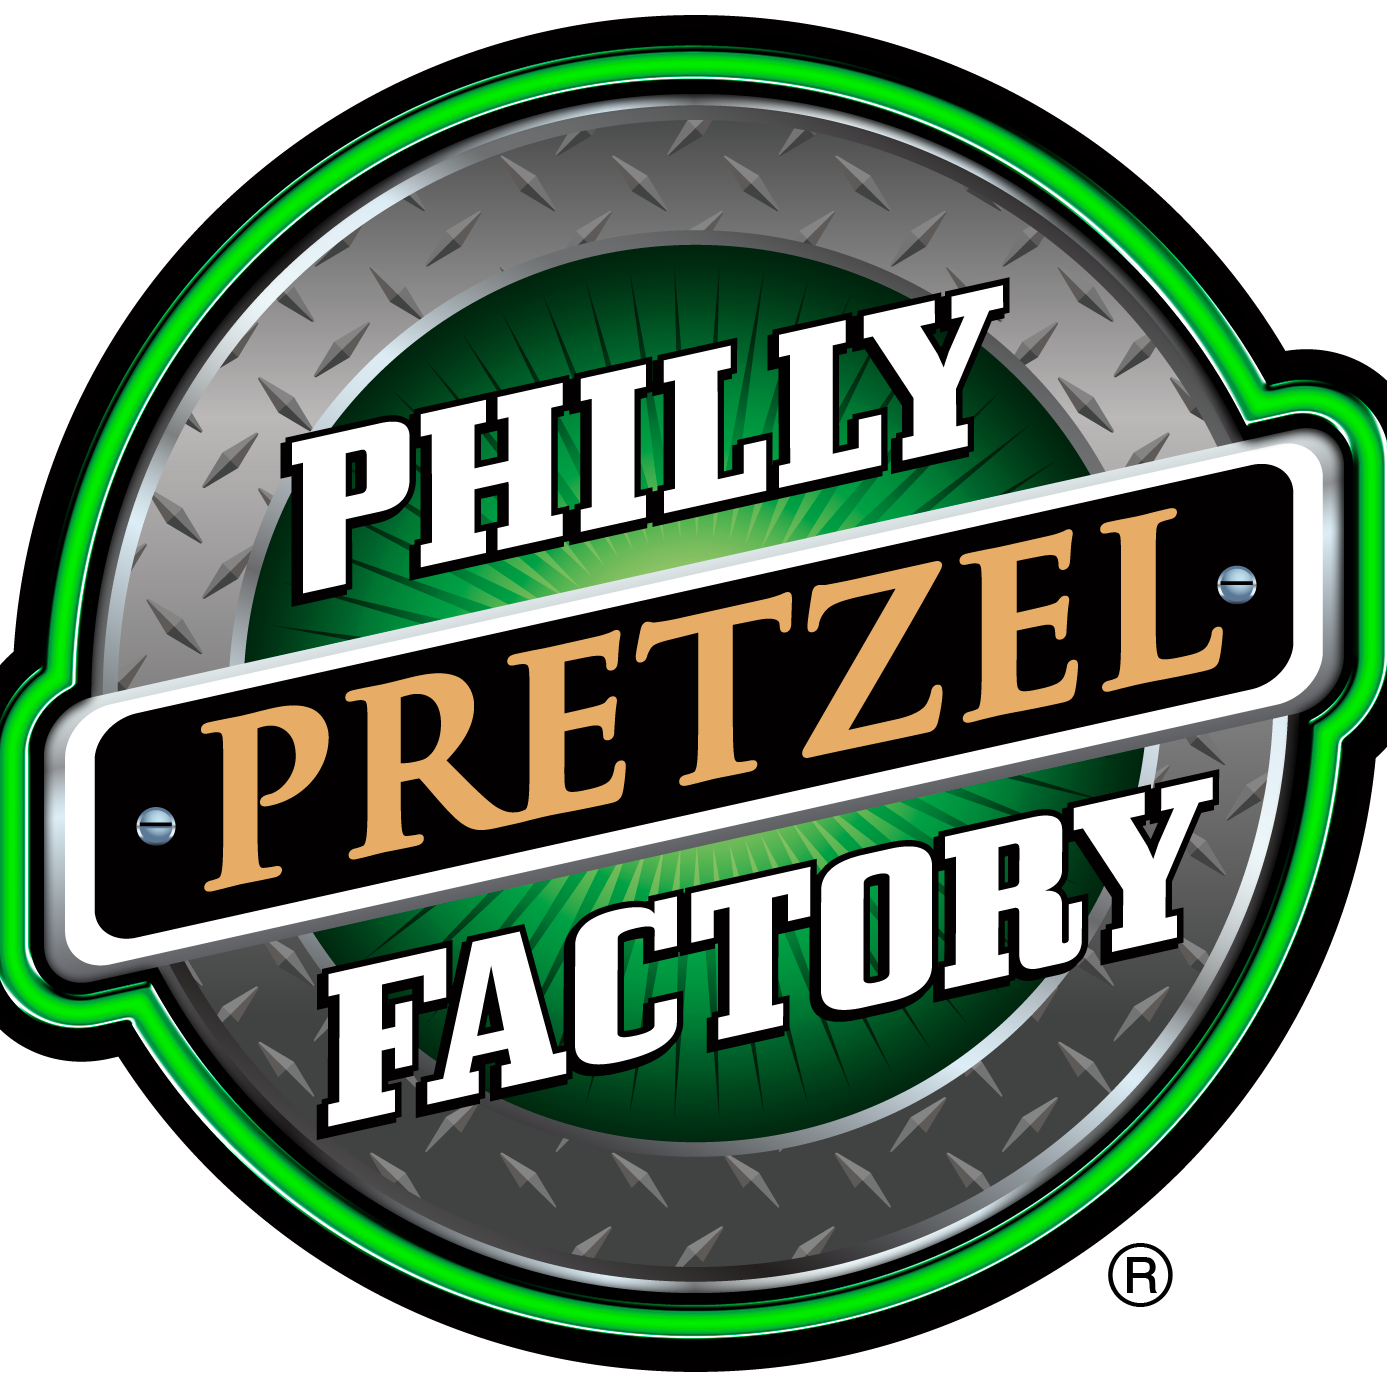 Philly Pretzel Factory image 1